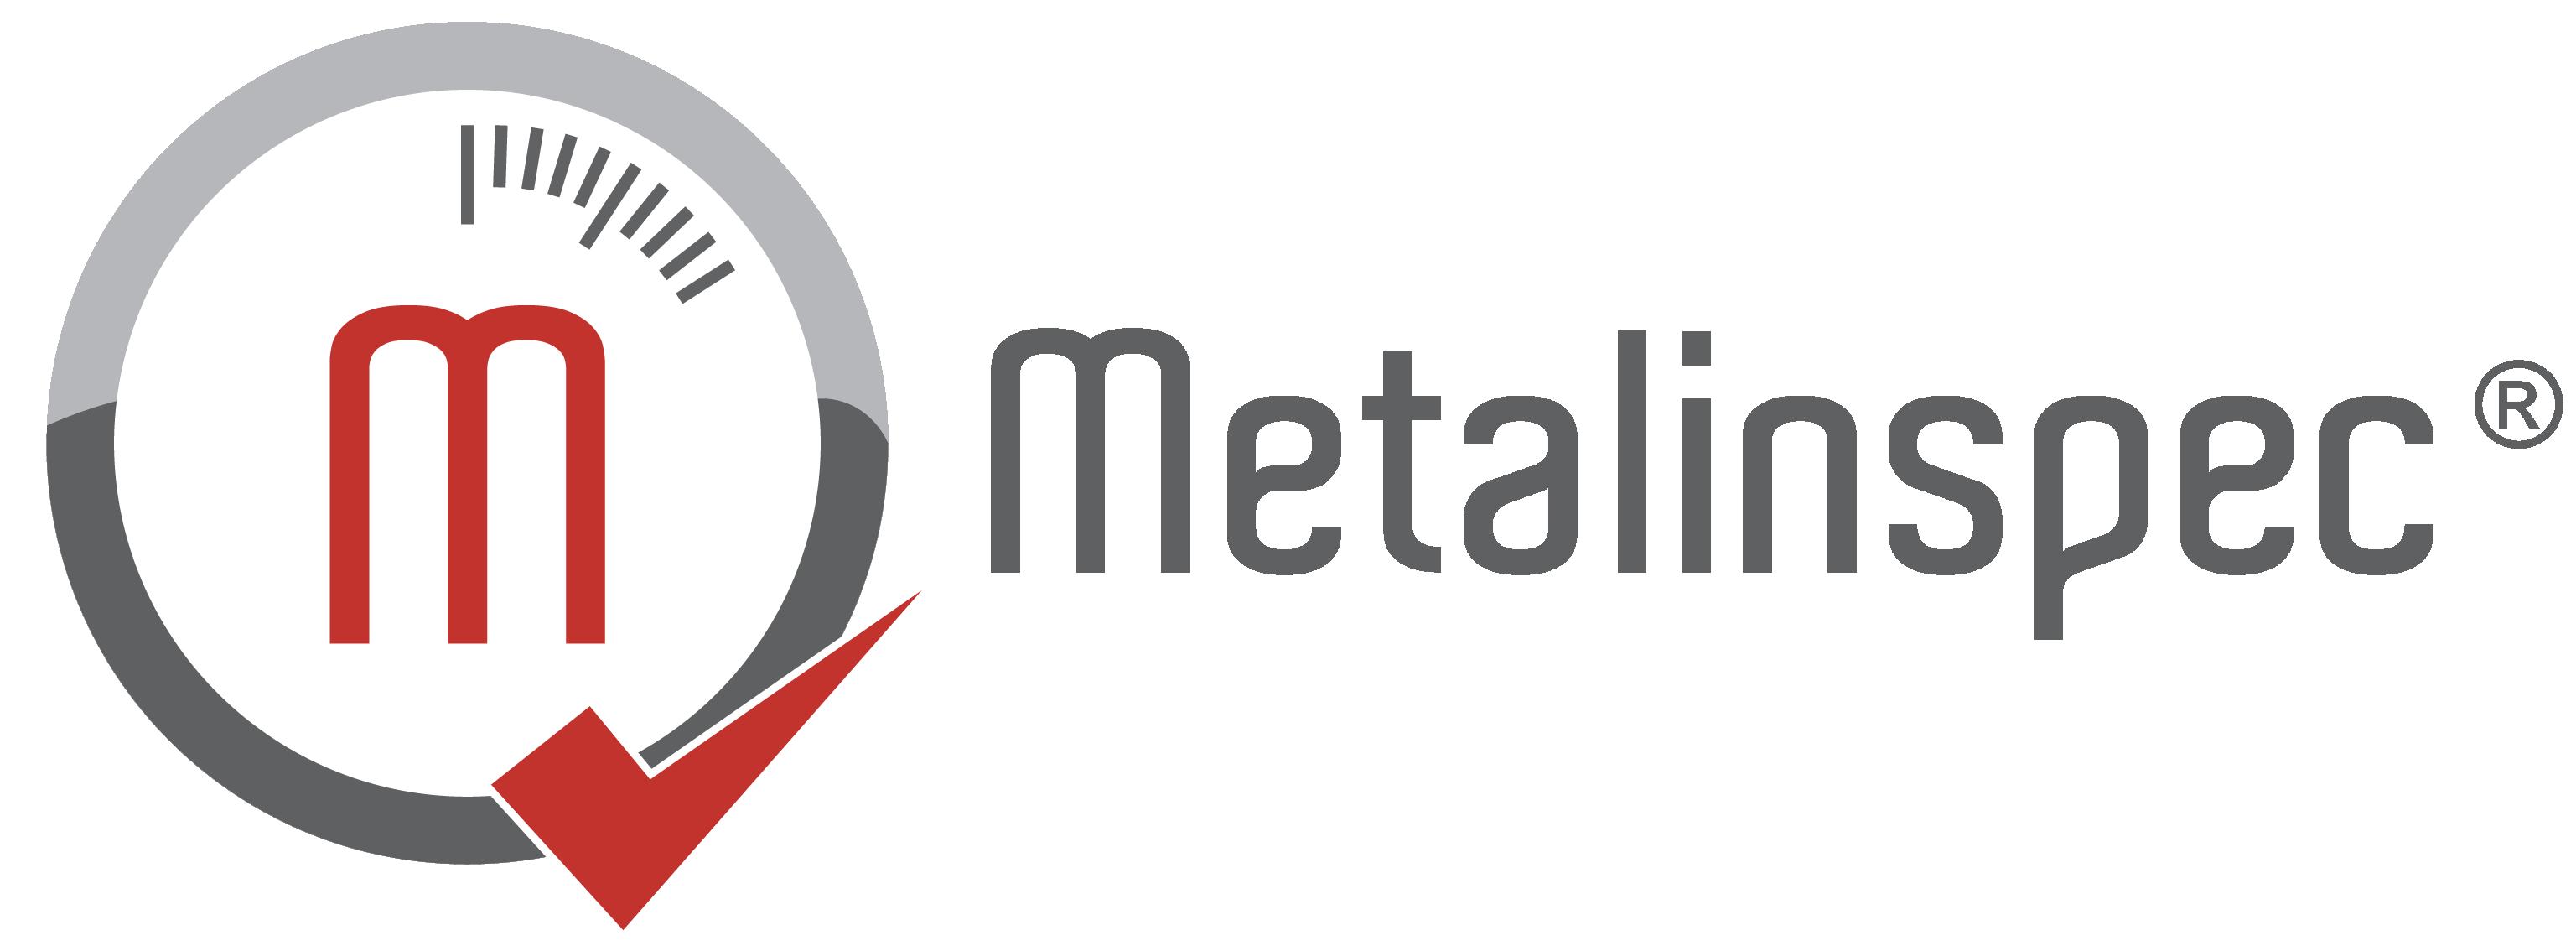 Metalinspec Logo